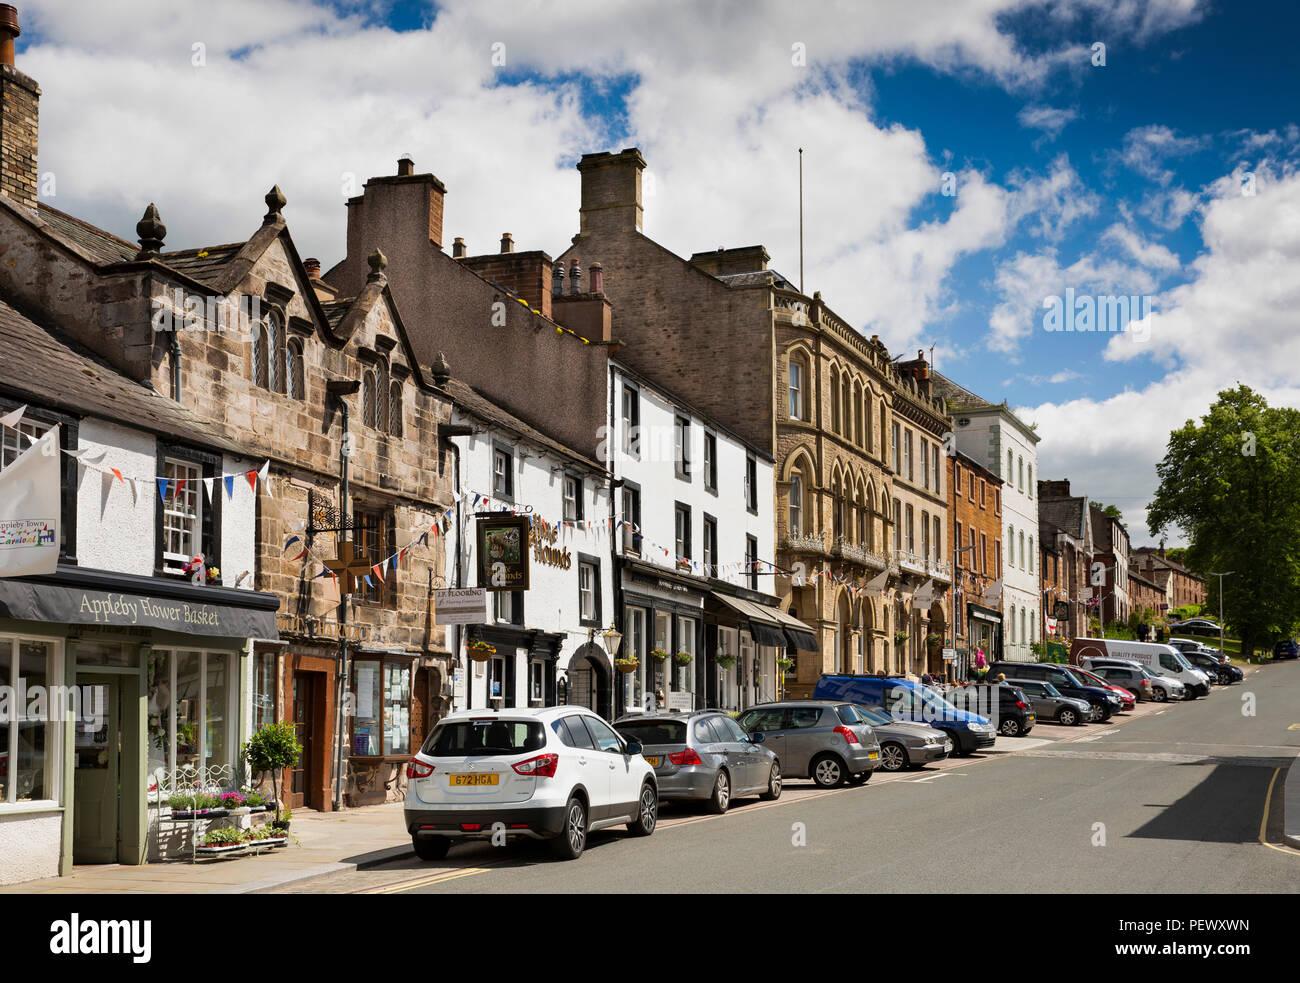 UK, Cumbria, Eden Valley, Appleby, Boroughgate - Stock Image